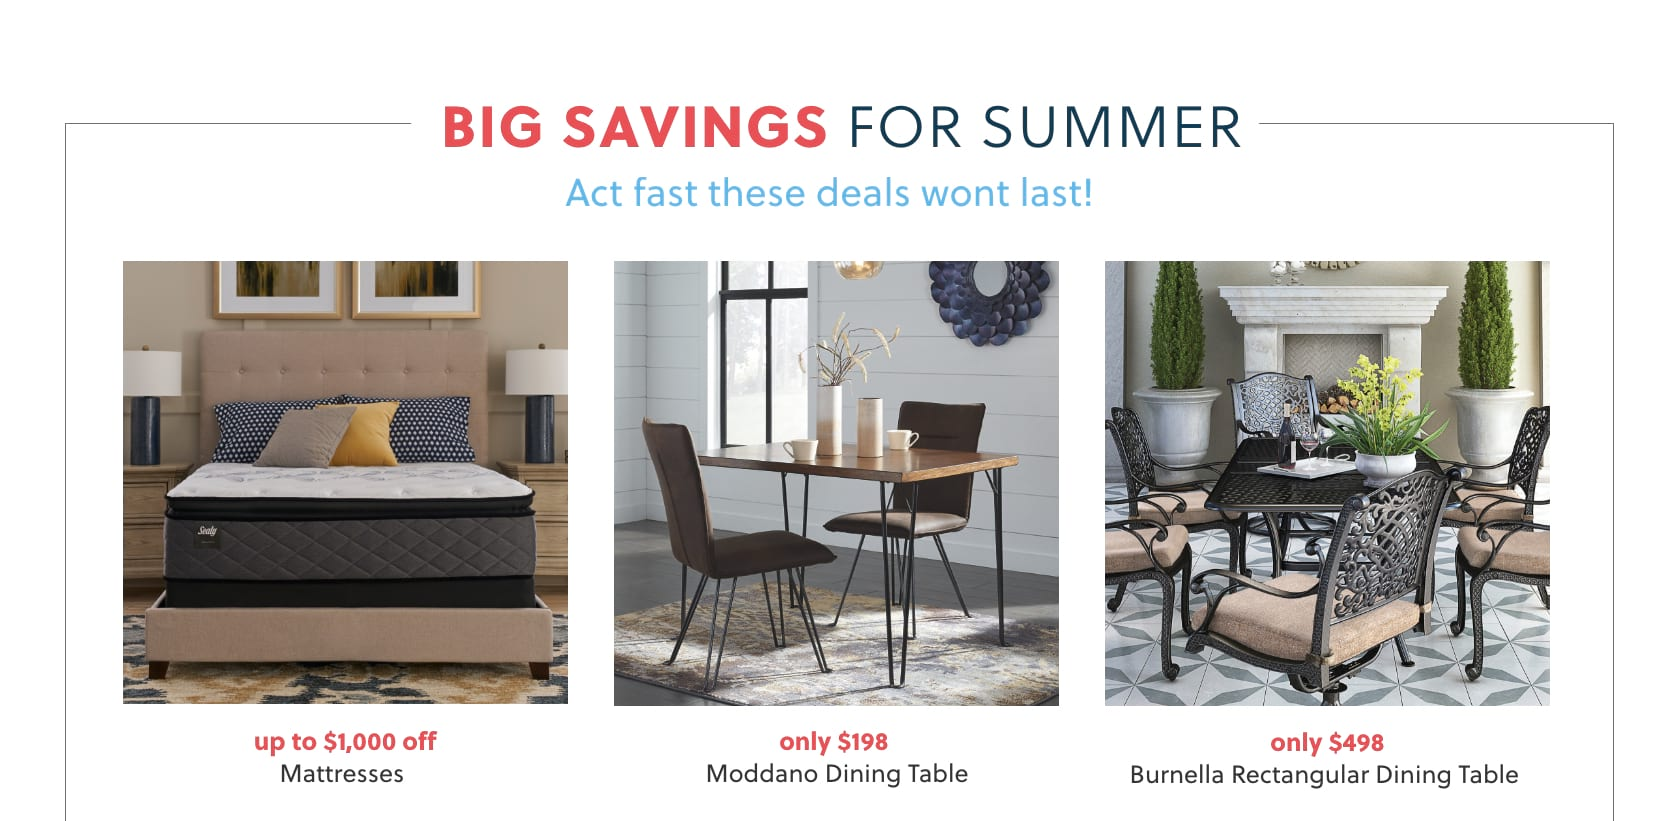 Ashley Furniture HomeStore | Home Furniture & Decor